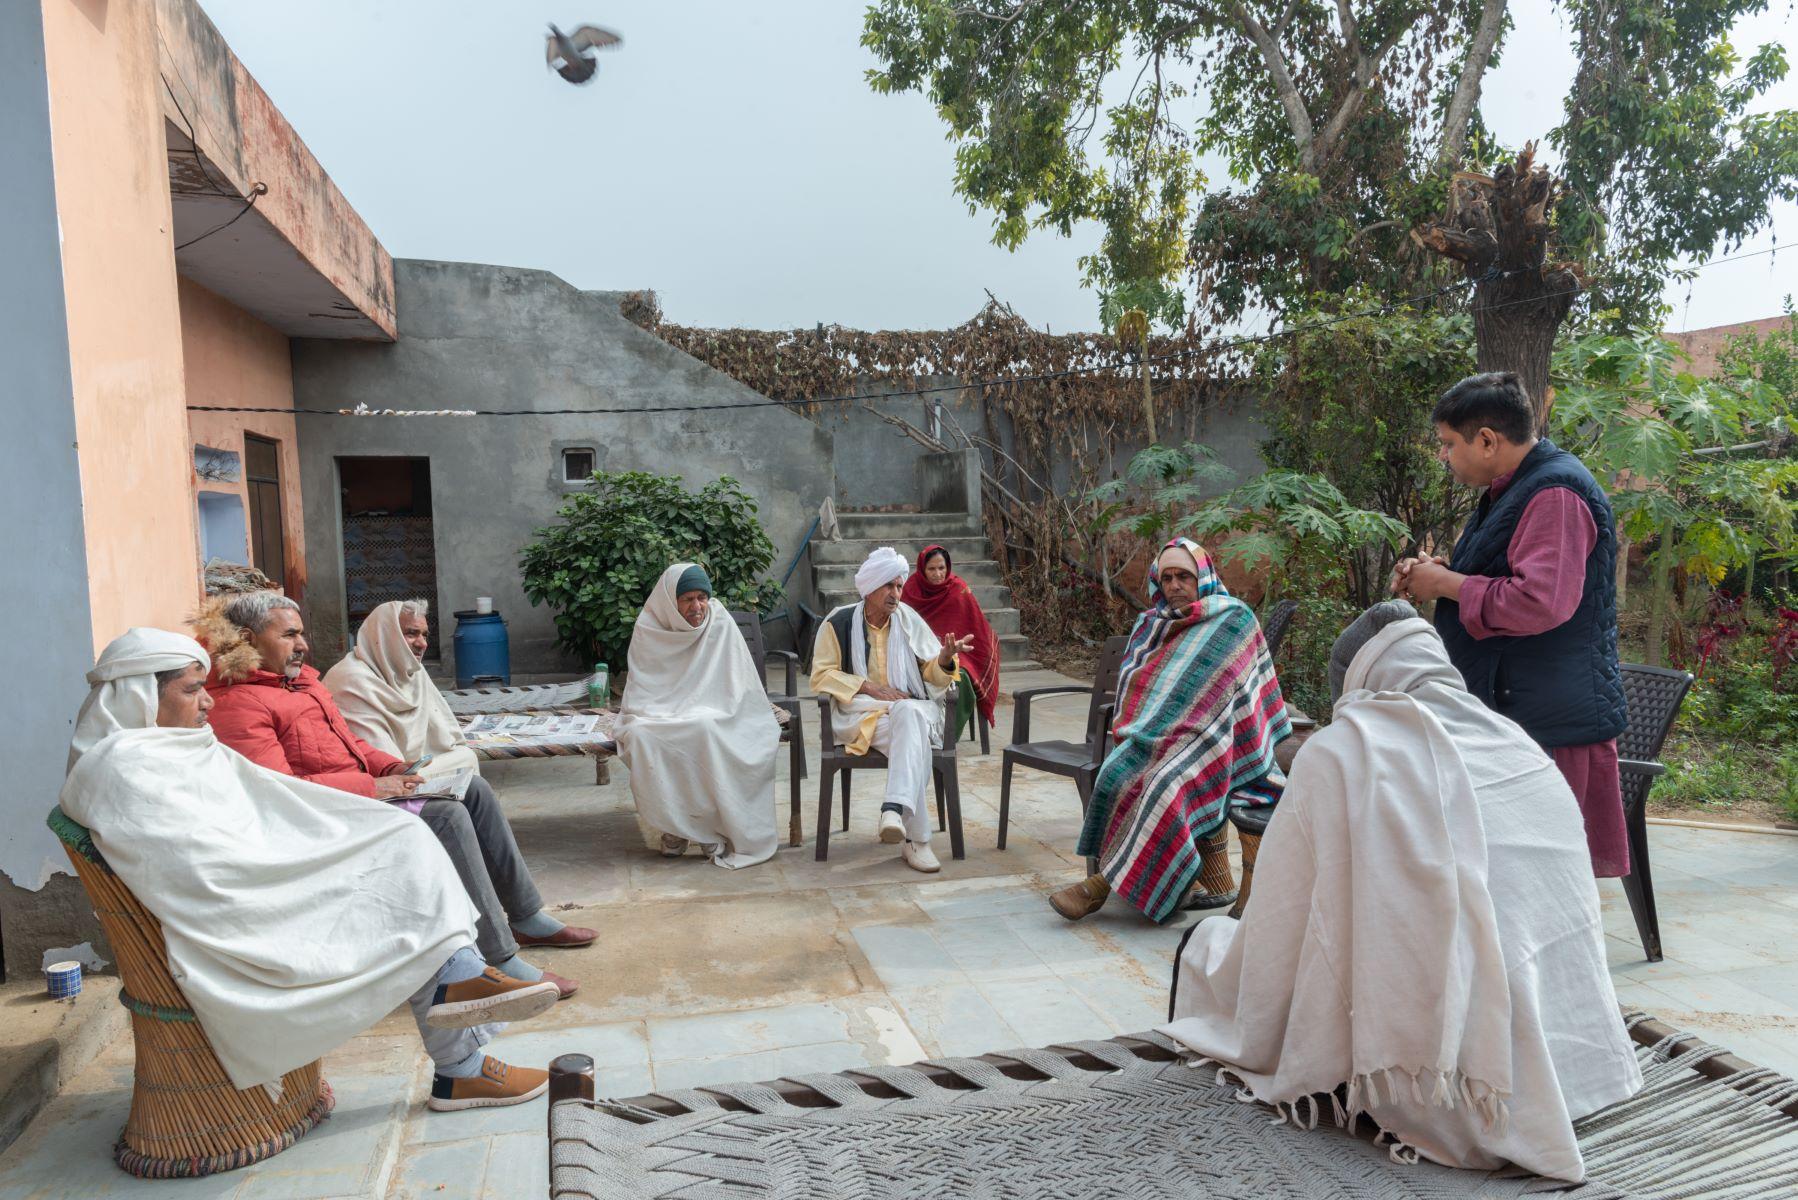 Rishi Kant at a meeting with some members of the Khap Panchayat at Dhakla village, Haryana